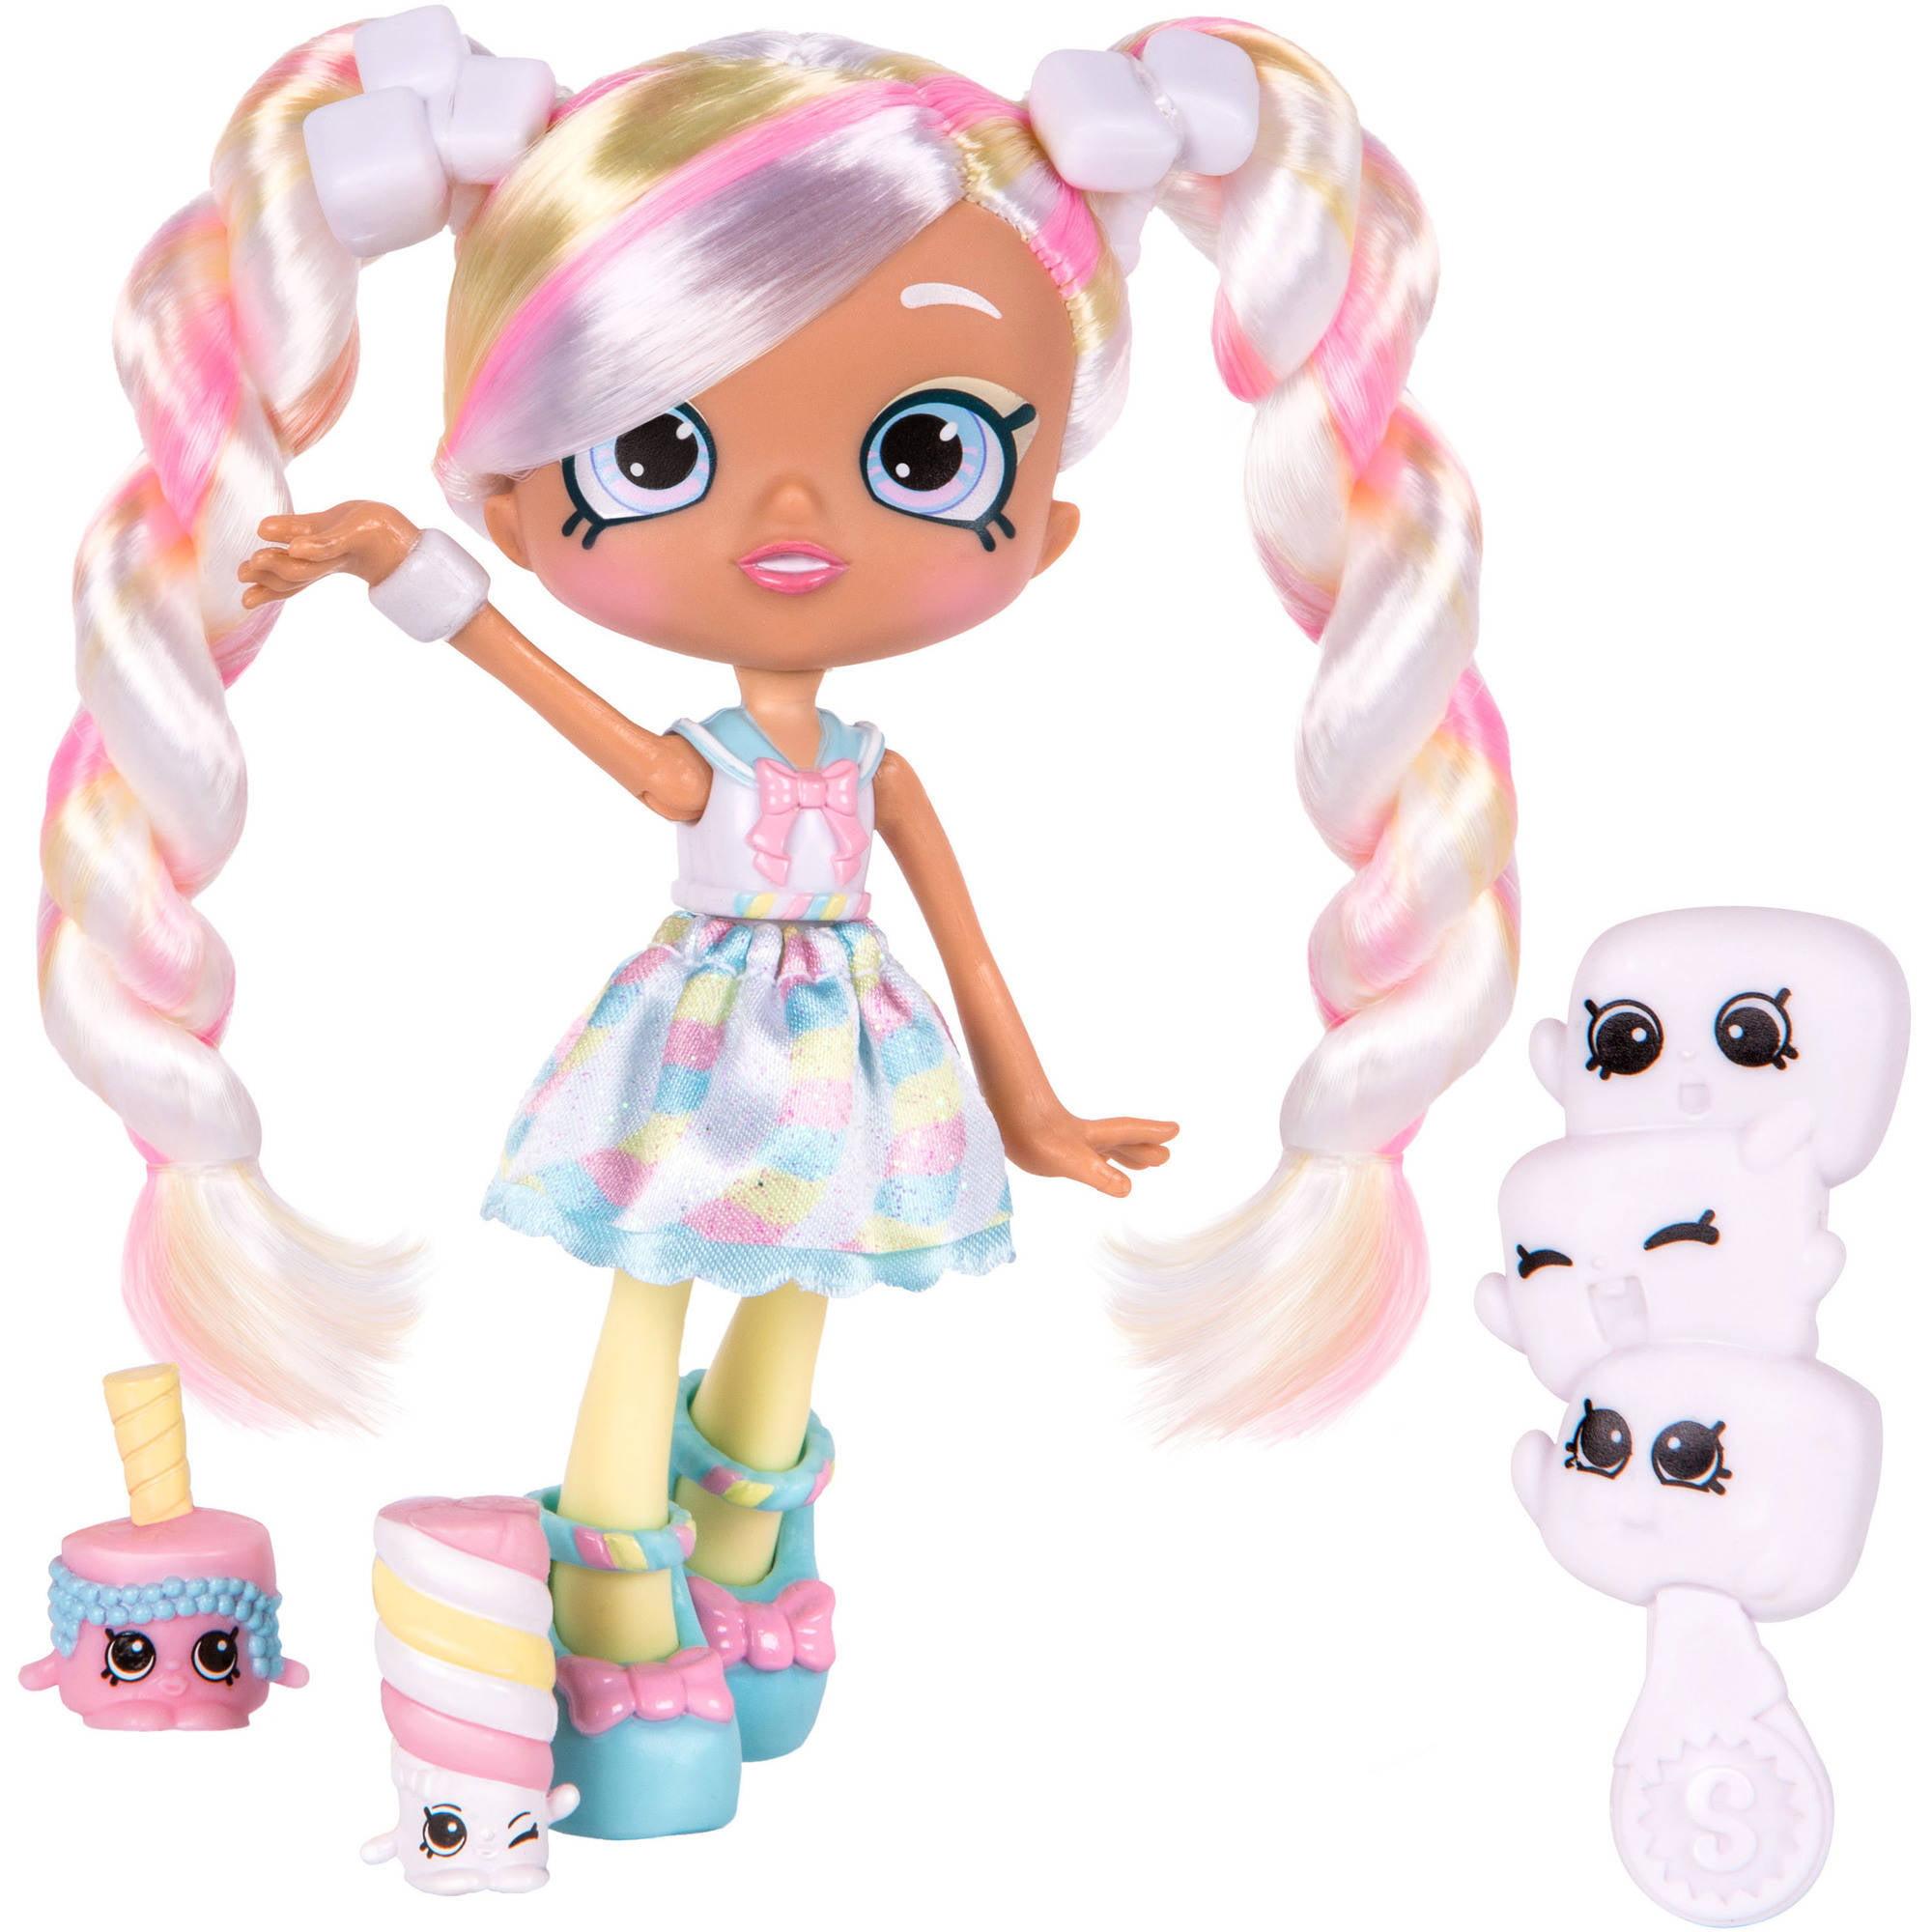 Shopkins Shoppies Season 3 Dolls, Marsha Mello by Moose toys